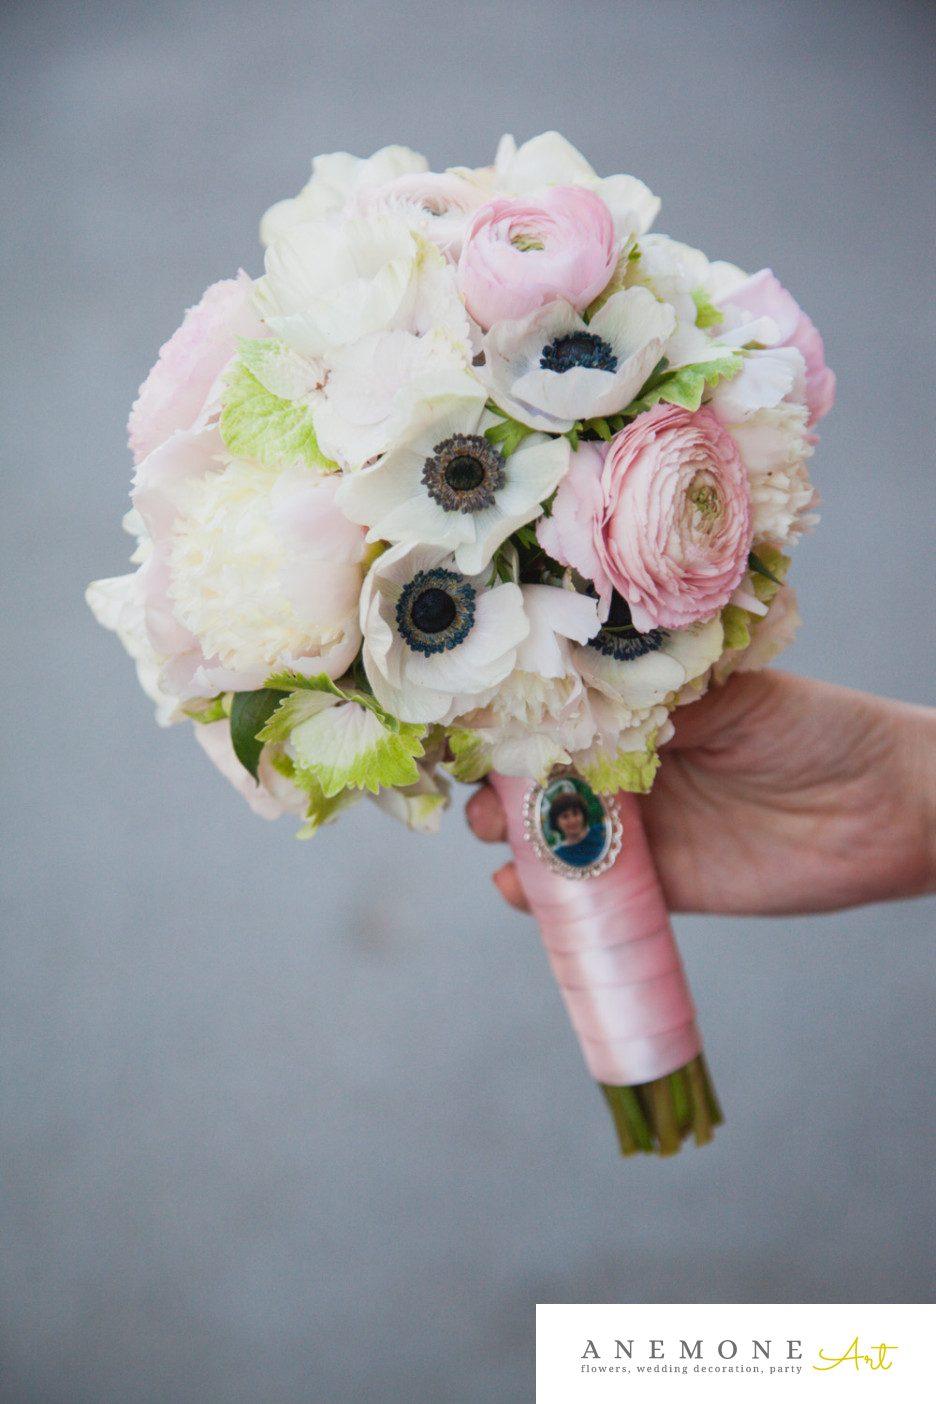 Poza, foto cu Flori de nunta alb, anemone, buchet mireasa, crem, maner buchet, ranunculus, roz in Arad, Timisoara, Oradea (wedding flowers, bouquets) nunta Arad, Timisoara, Oradea